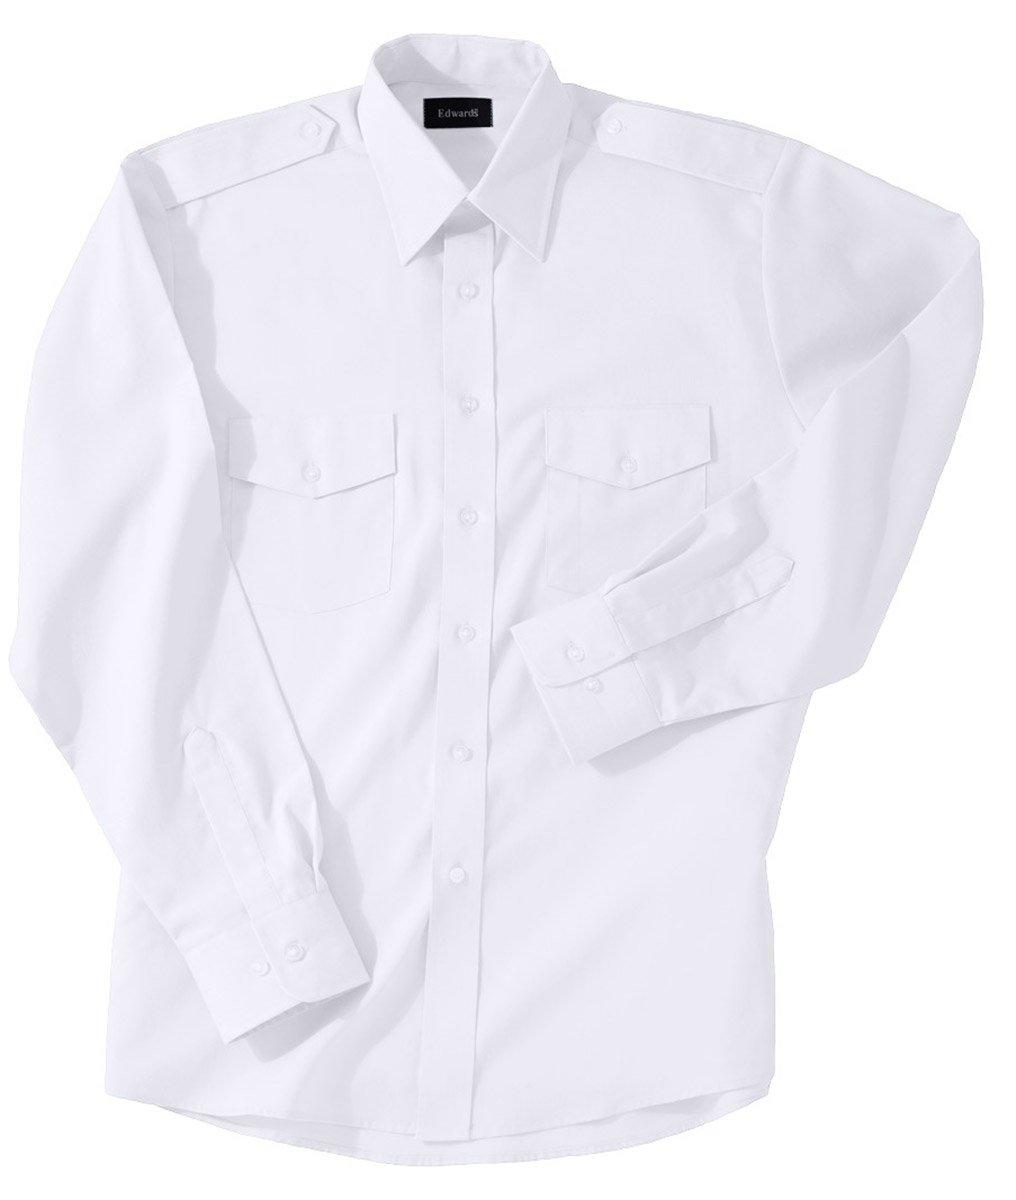 Edwards Garment SHIRT メンズ B07BXN37XP XXXL ホワイト ホワイト XXXL